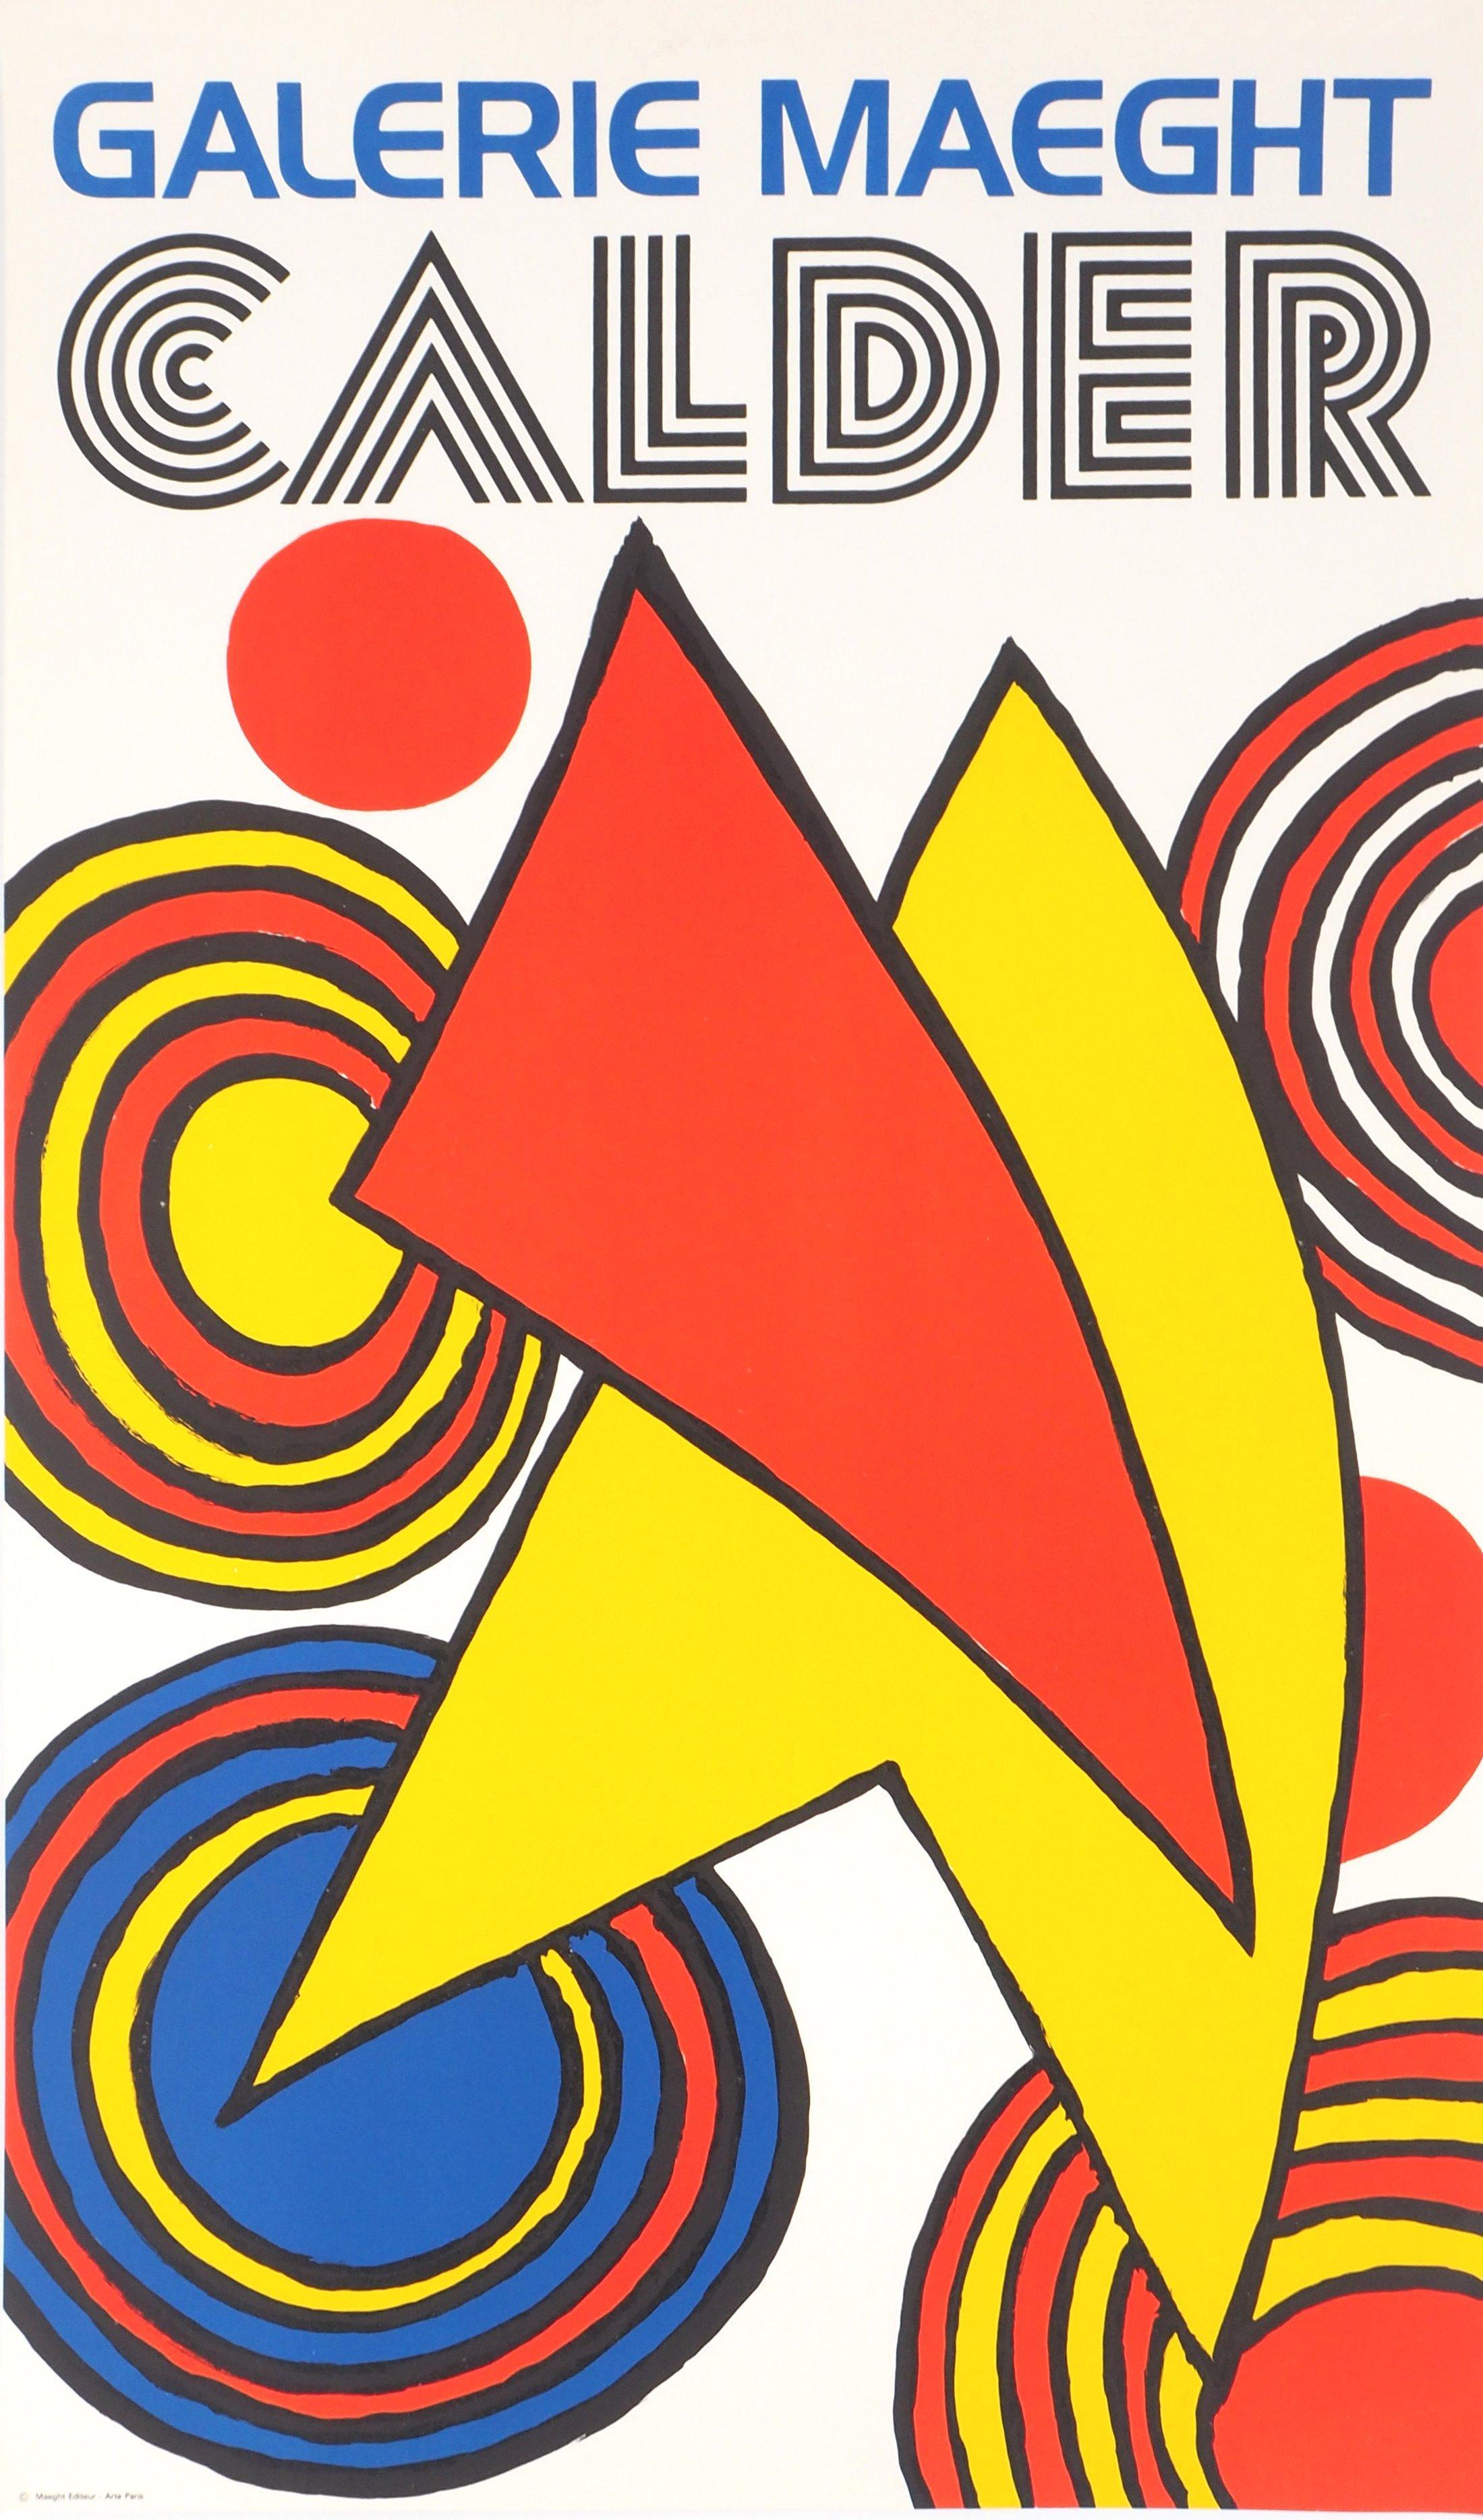 Circles and Sails - Lithograph poster - Maeght, 1973